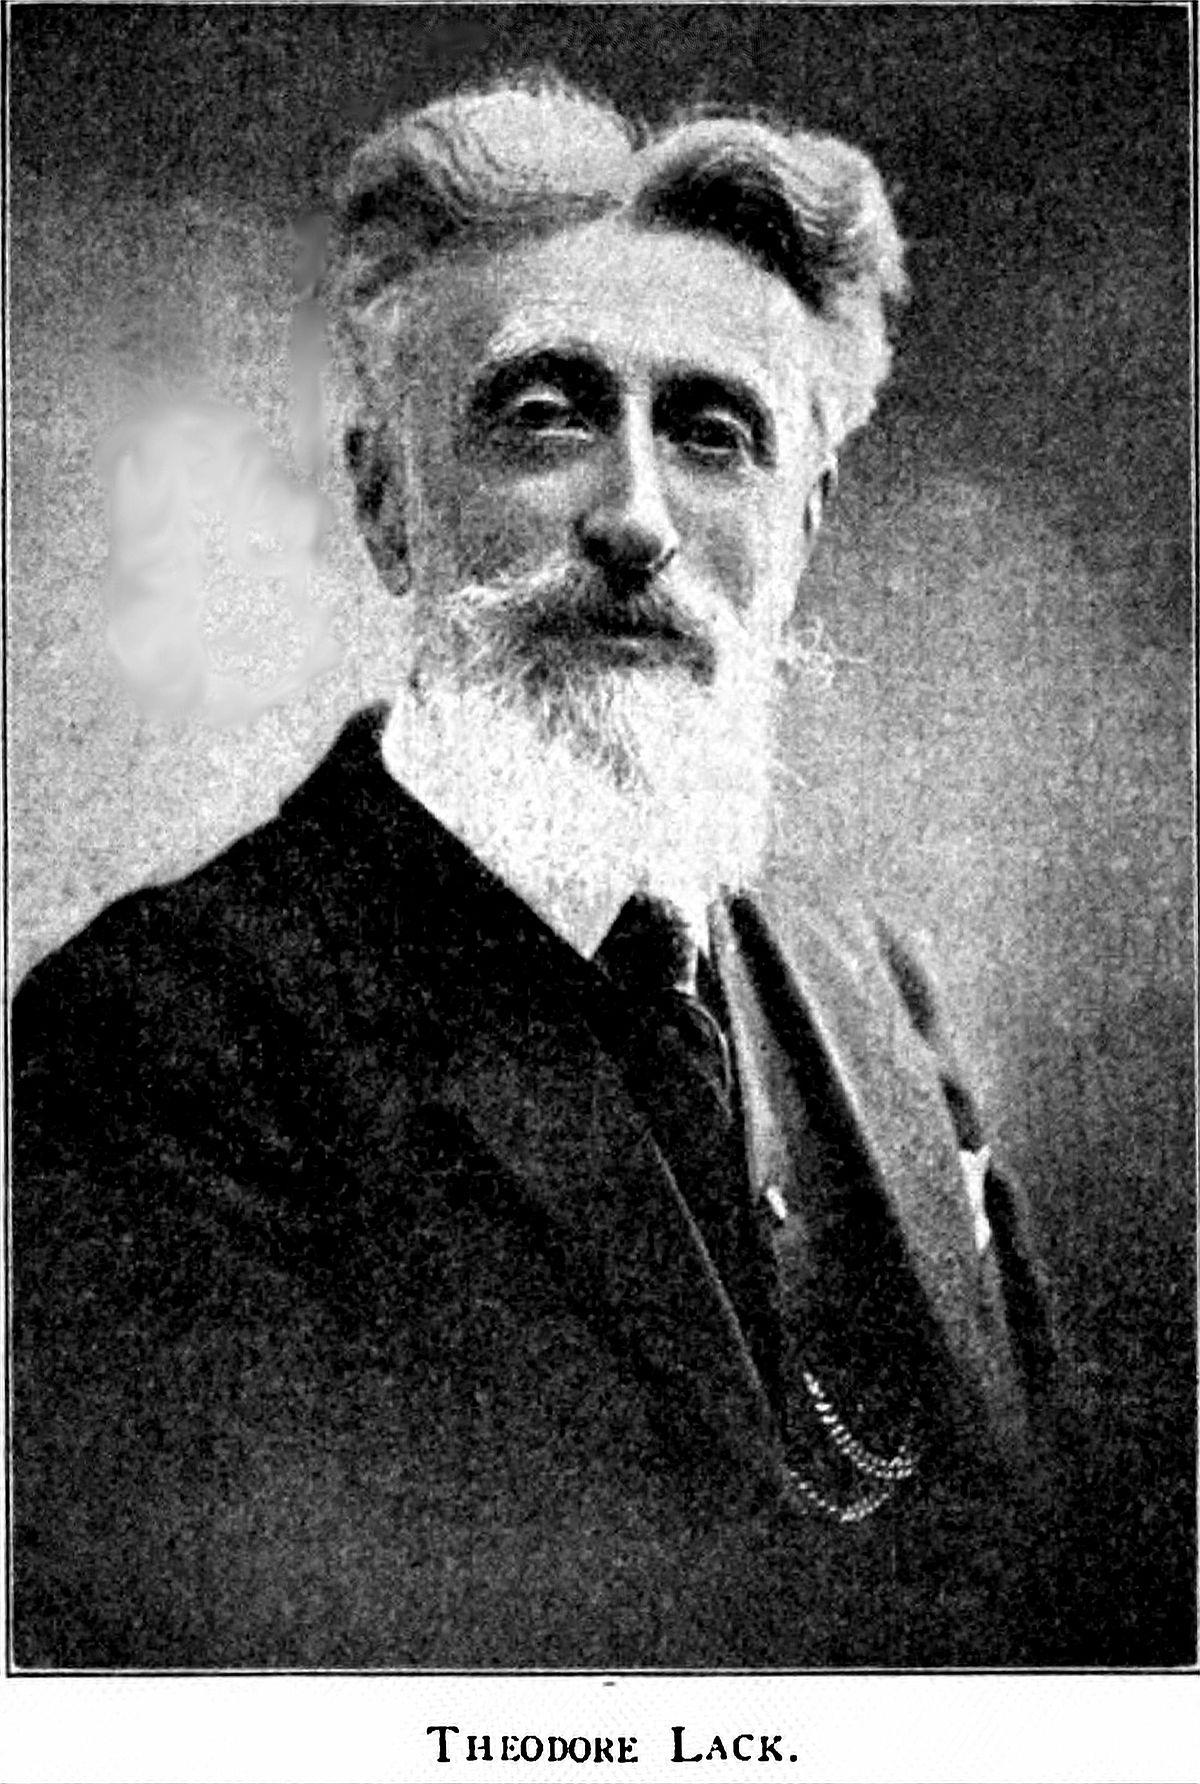 Théodore Lack - Wikidata Theodore Lack